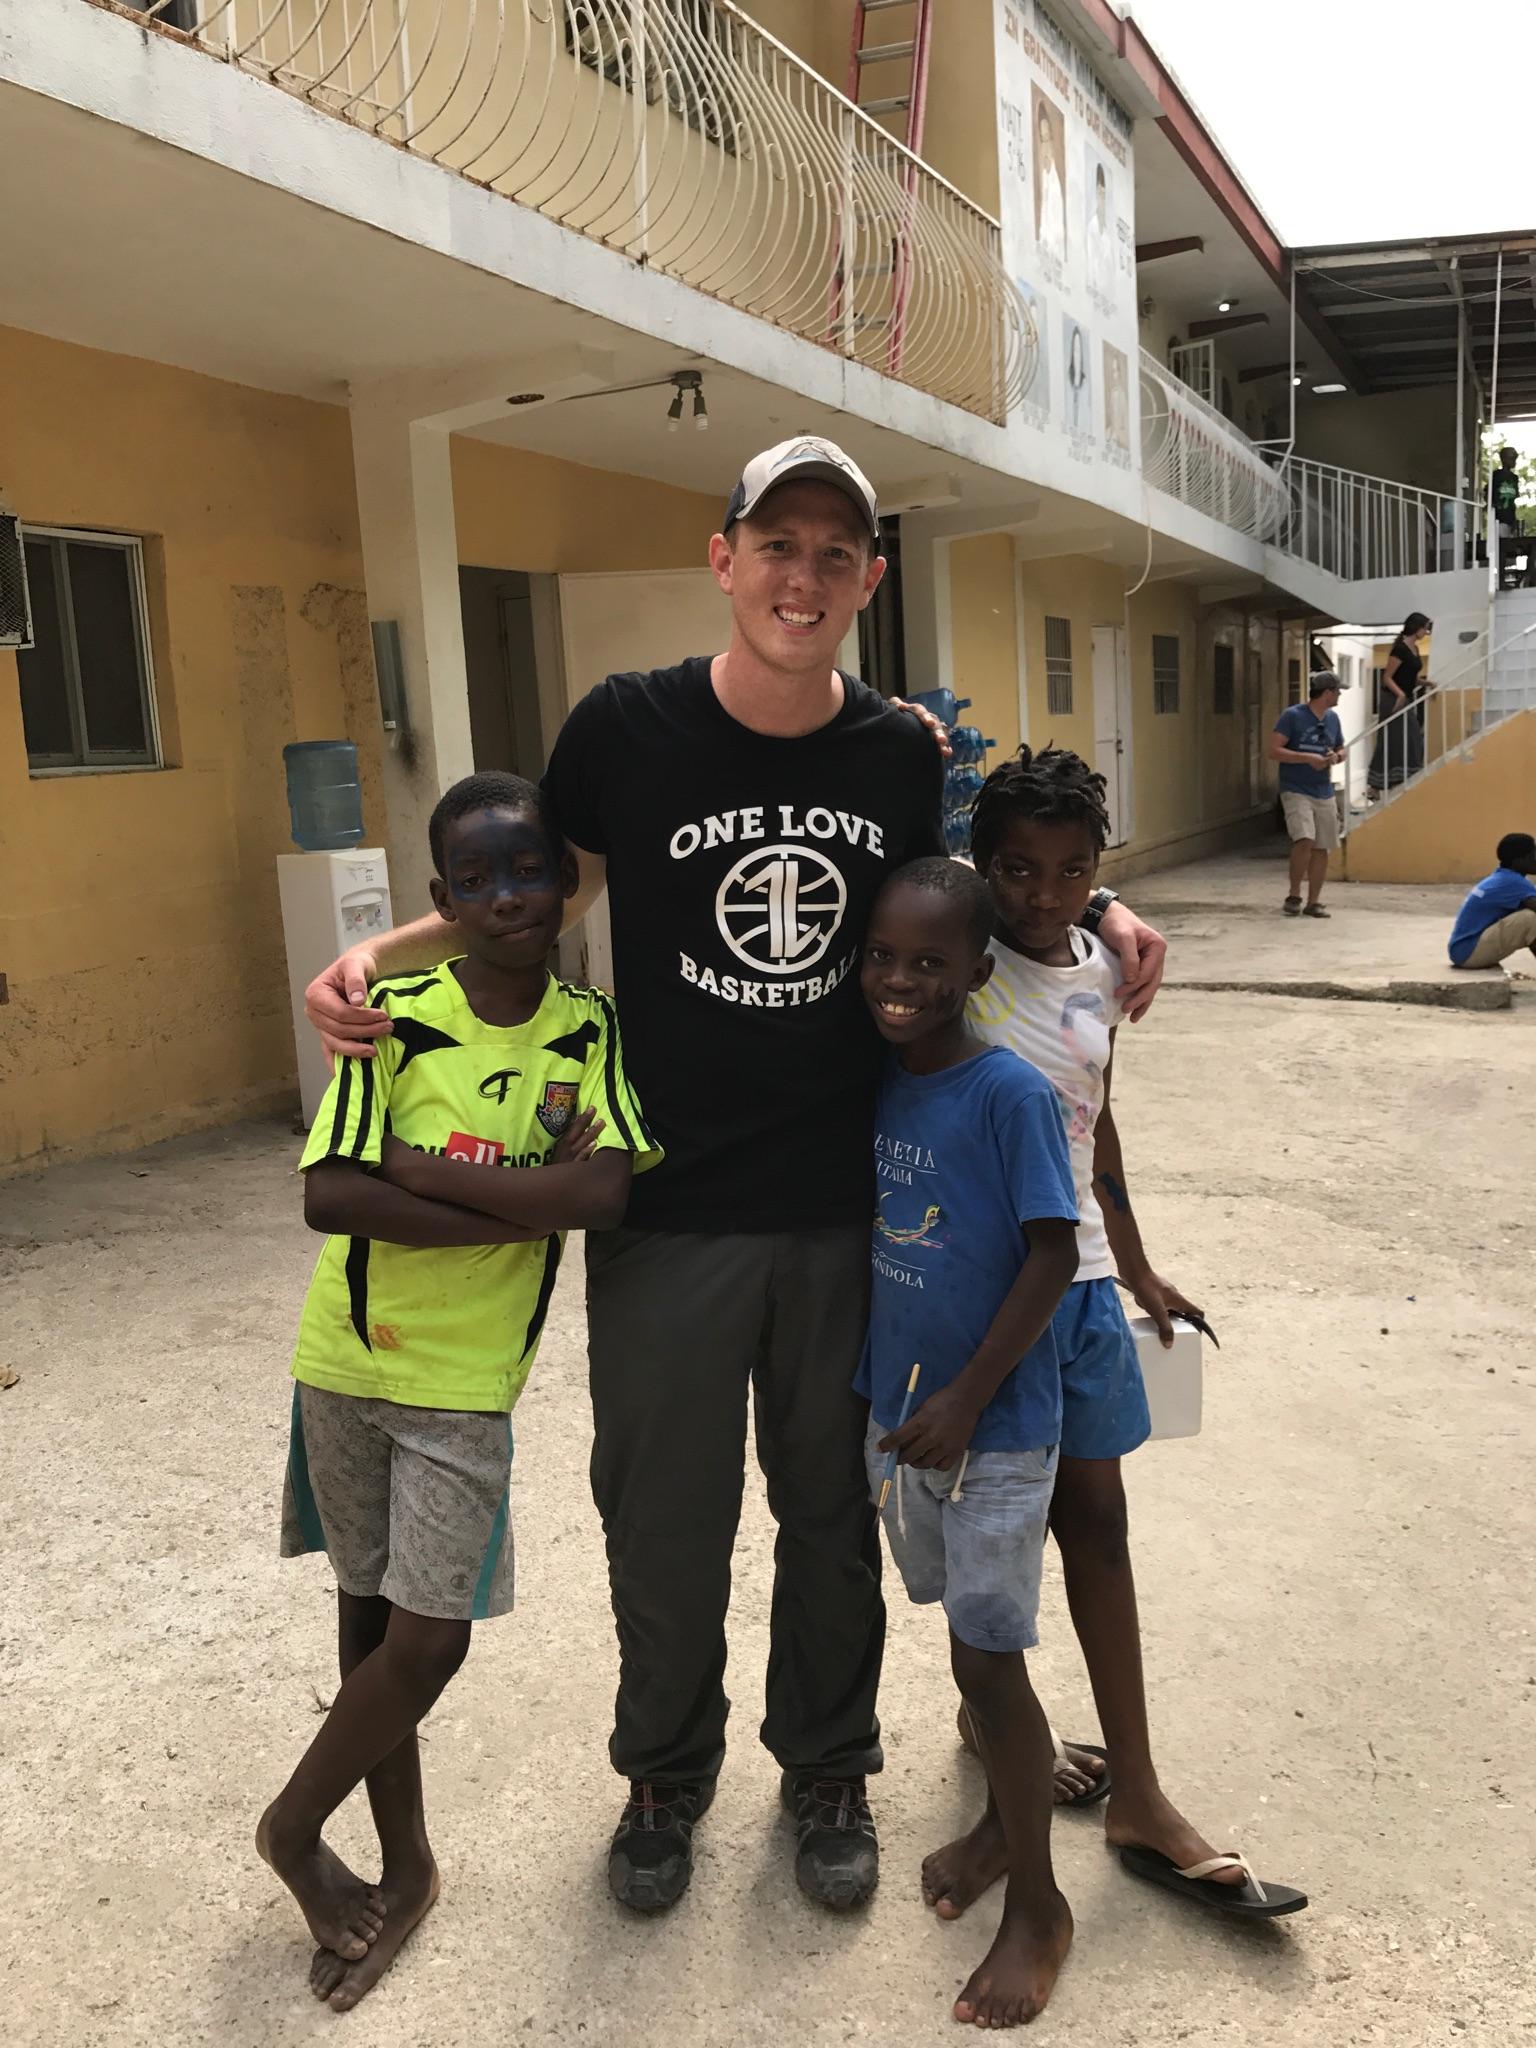 Pastor Matt,  Mission's Pastor at Hope Community Church , sharing the One Love of Jesus in Haiti last week.